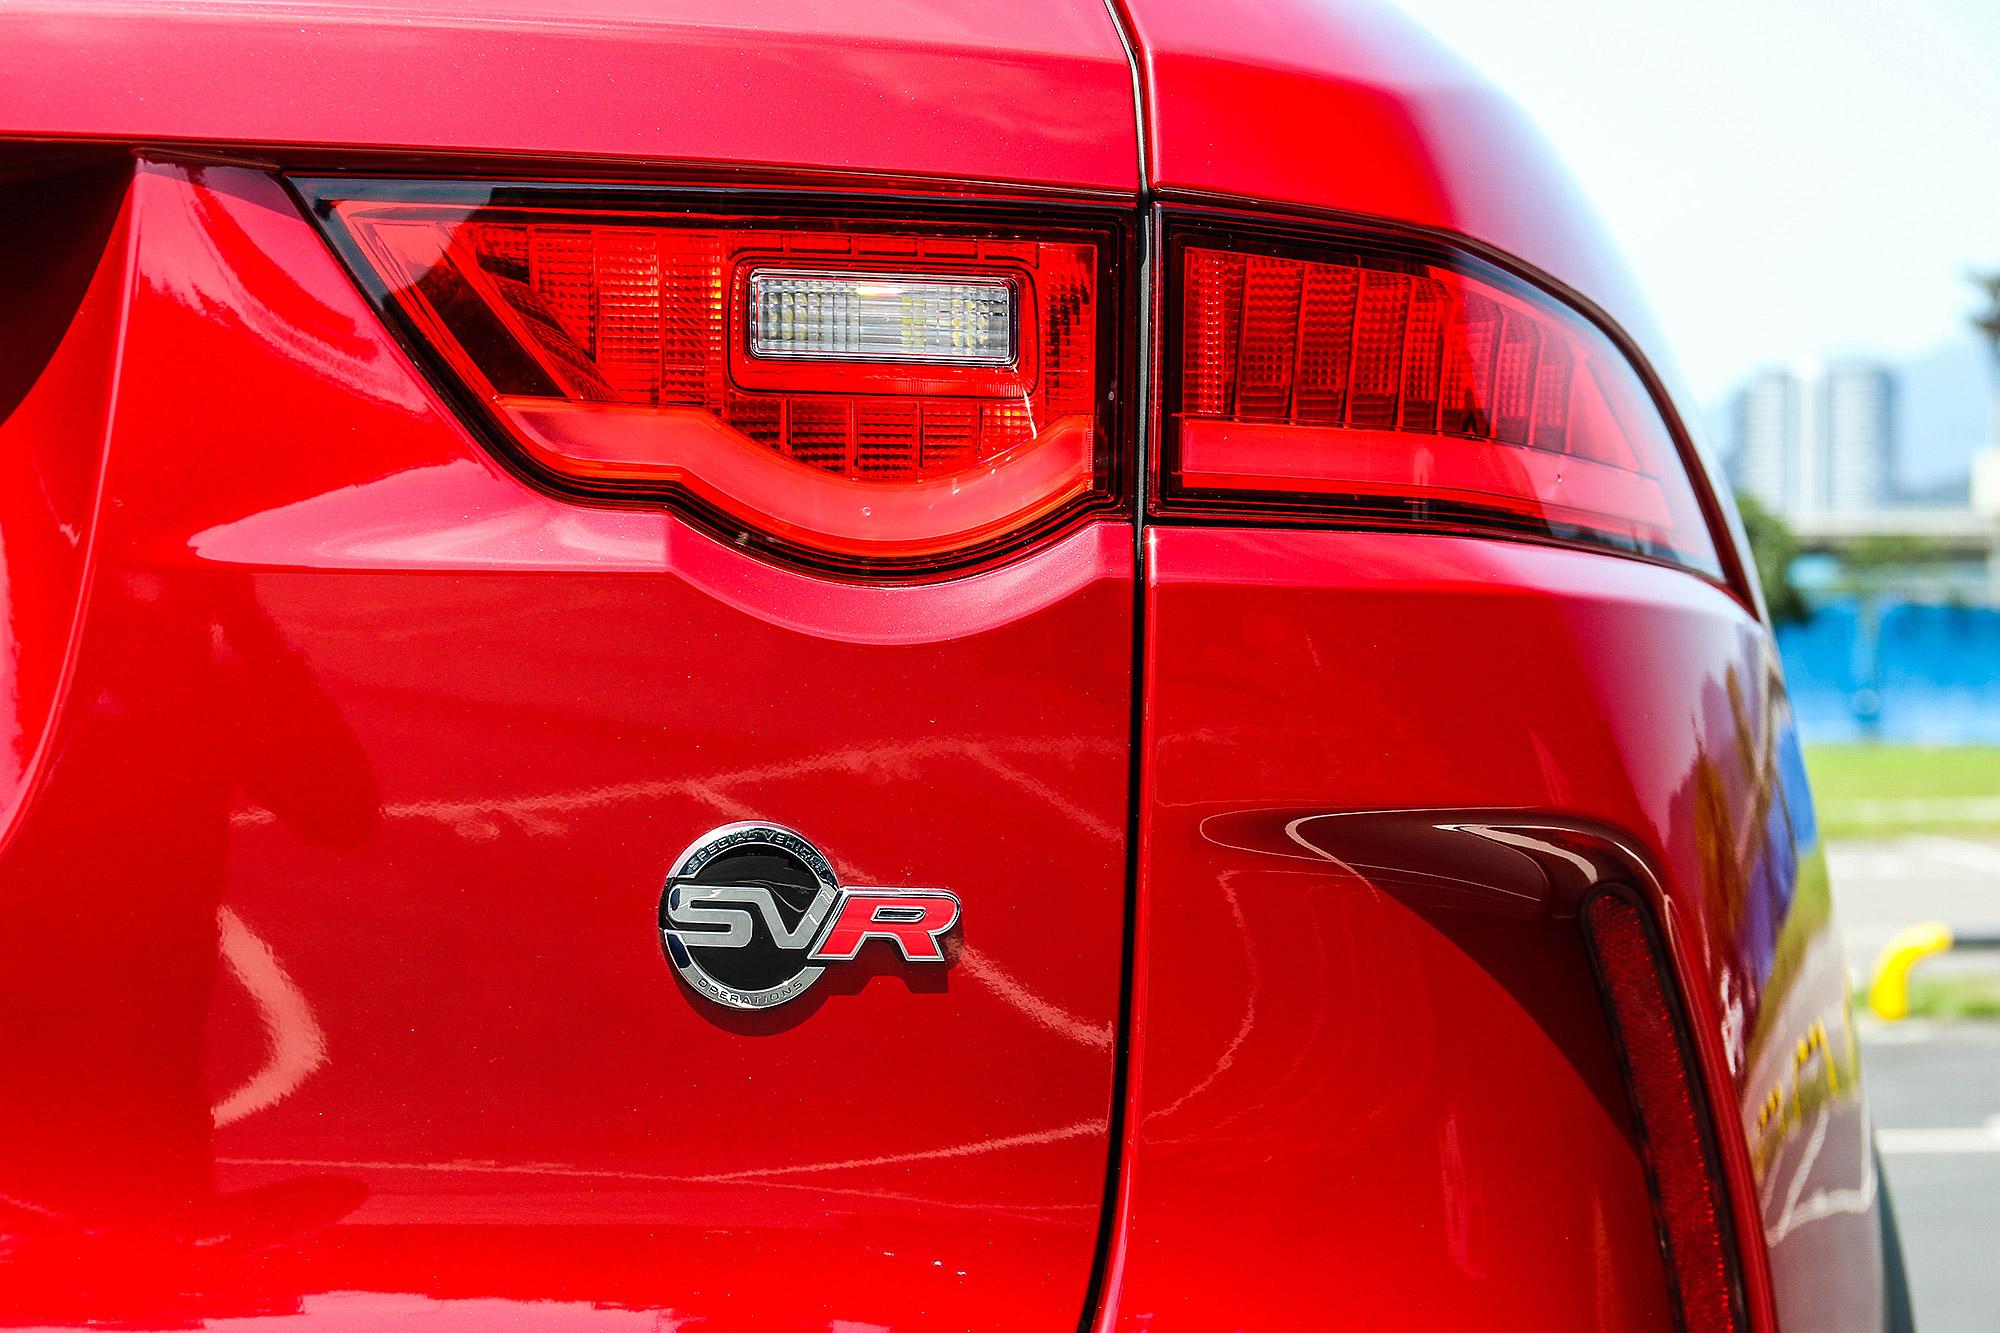 SVO 這次將手伸向了 F-Pace 車系,打造 F-Pace SVR 。